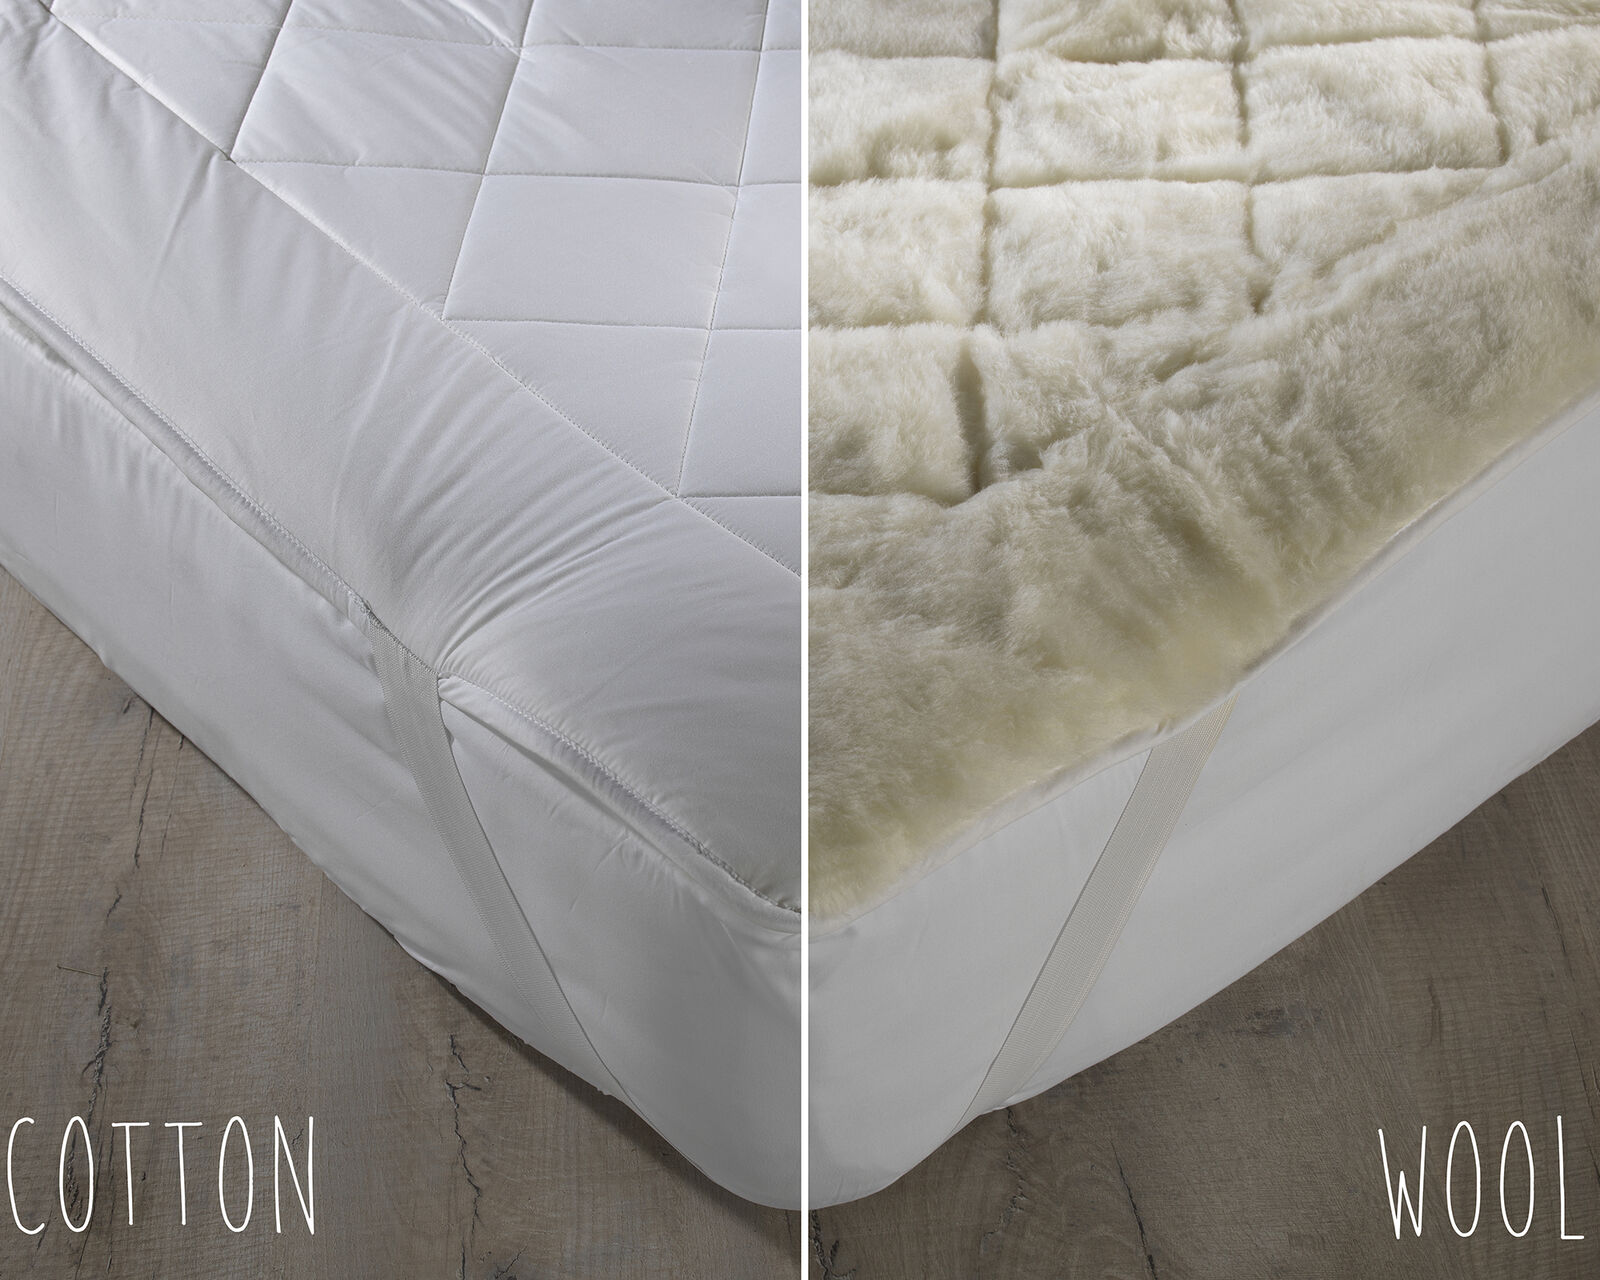 Natural Australian Wool   Cotton Reversible Mattress Topper with Corner Straps